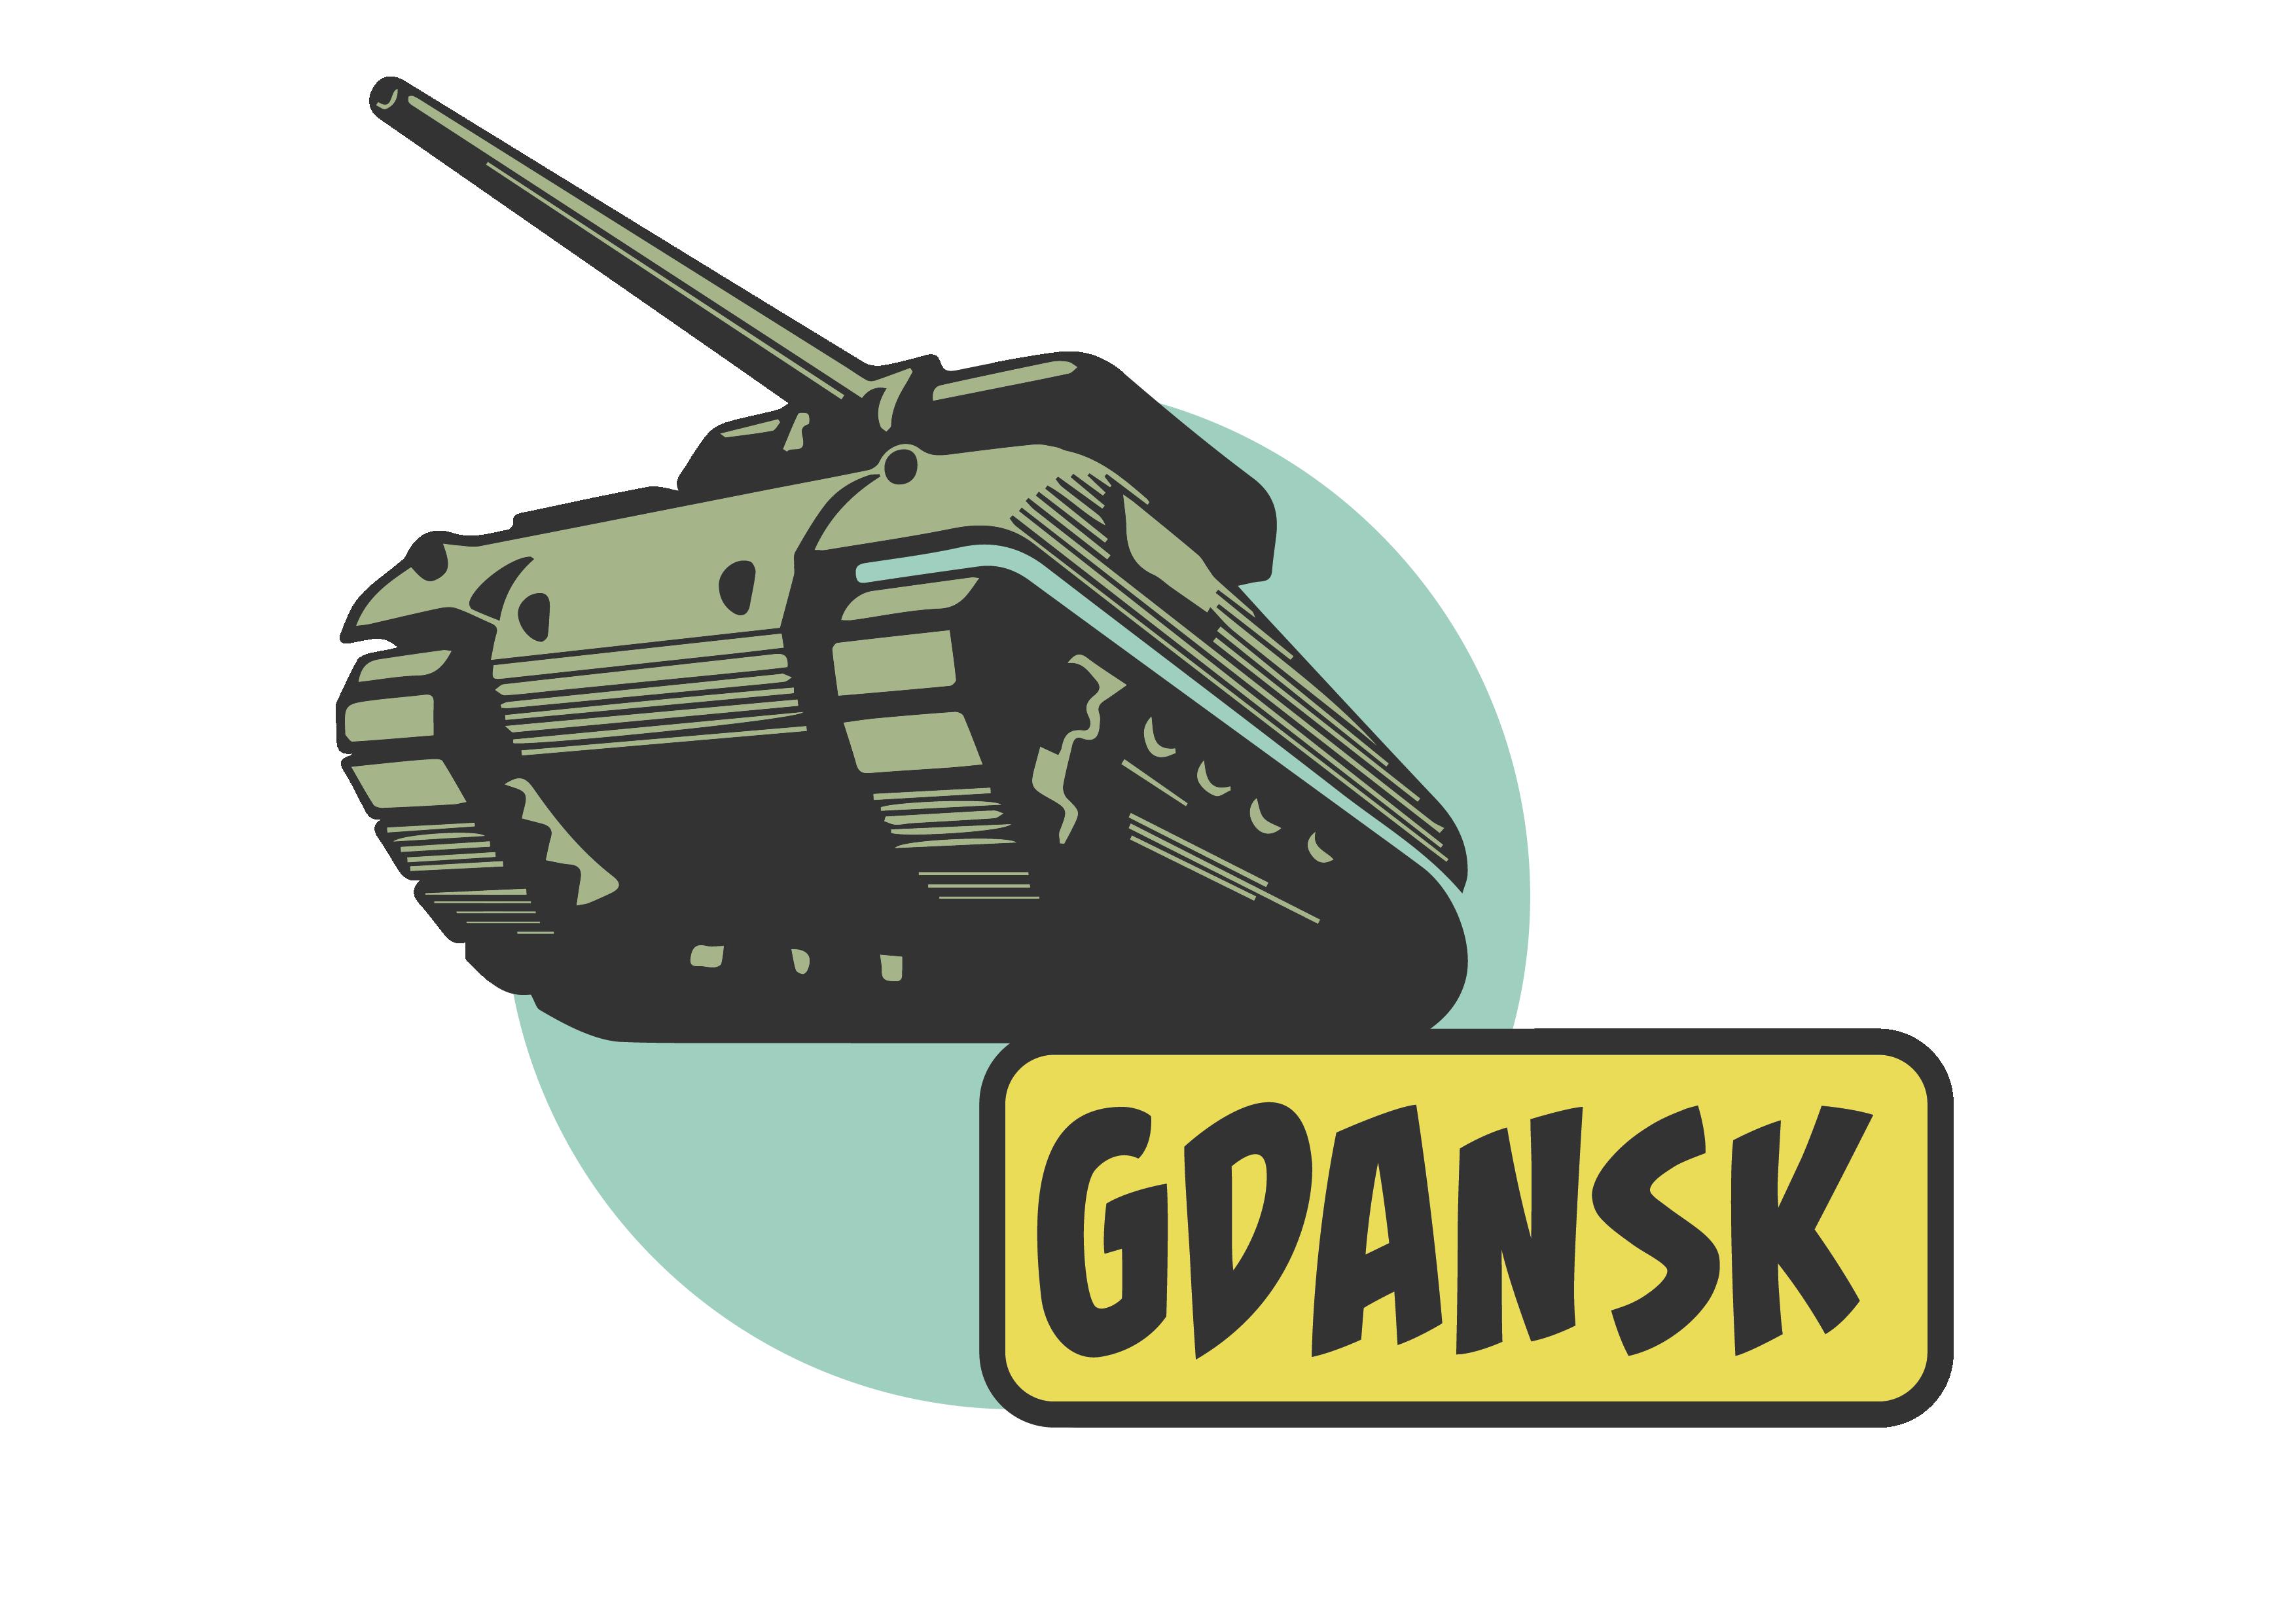 Gedansk